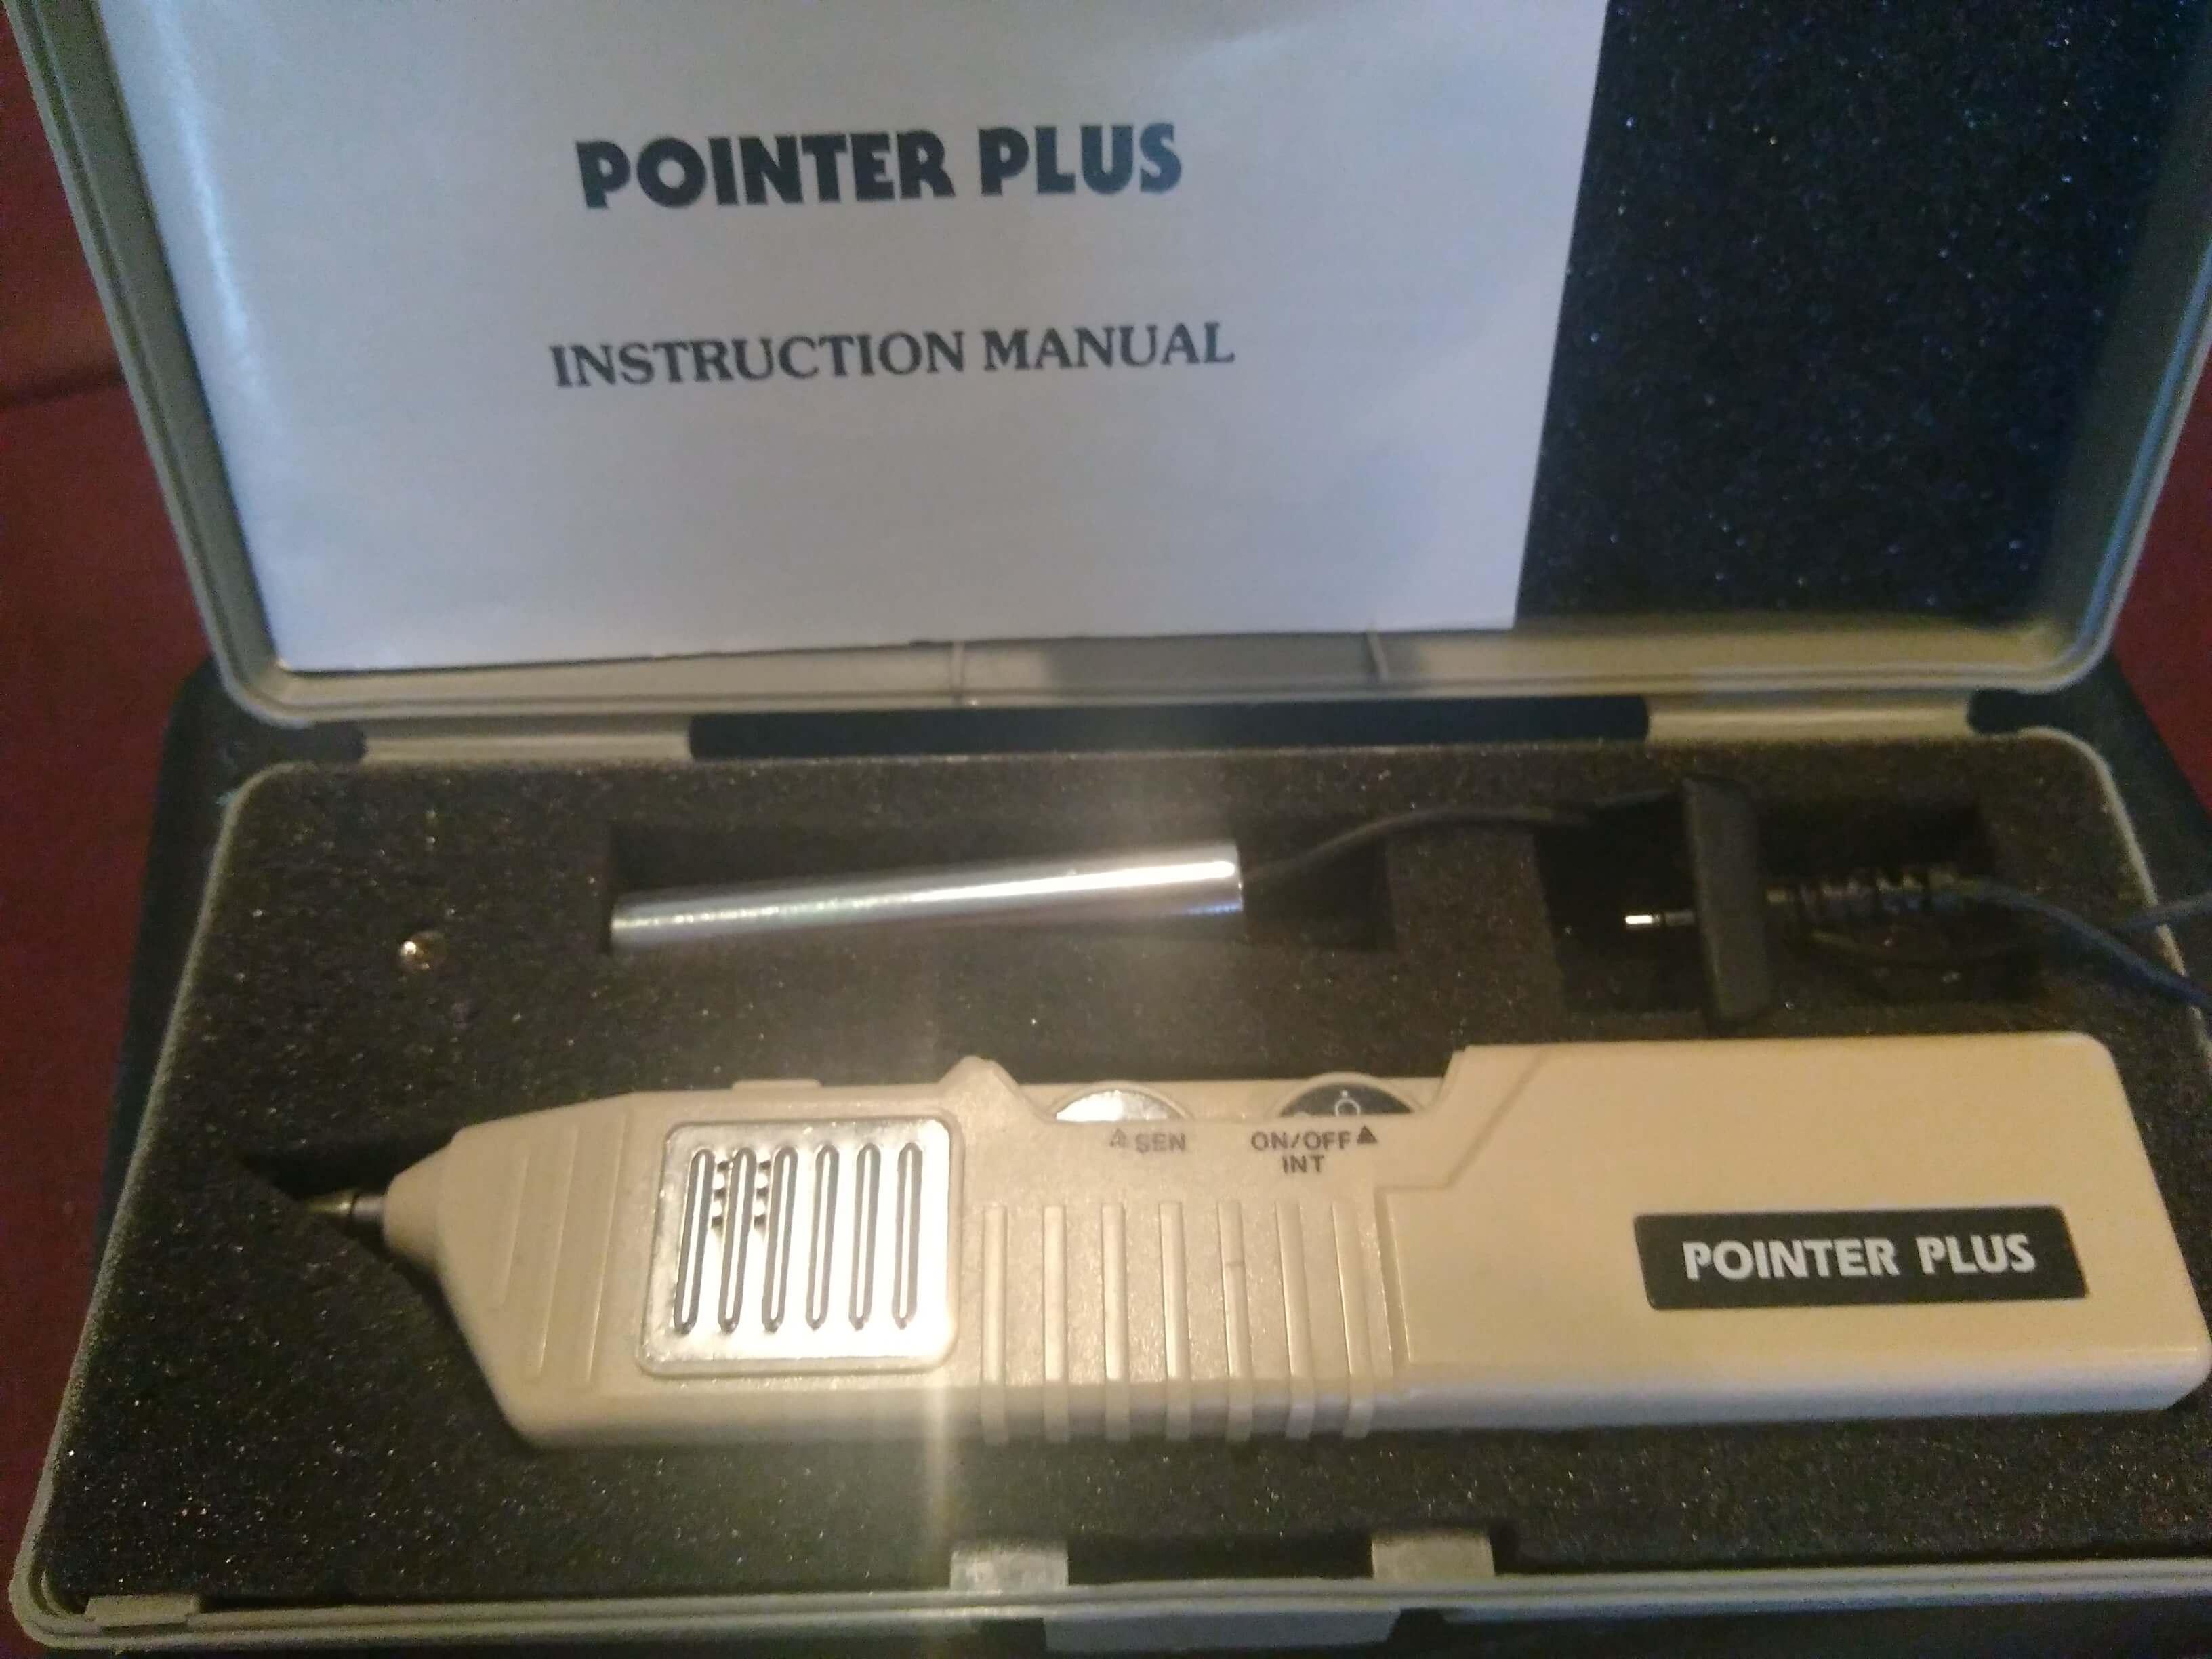 POINTER PLUS, Richmar iONTO+ id3